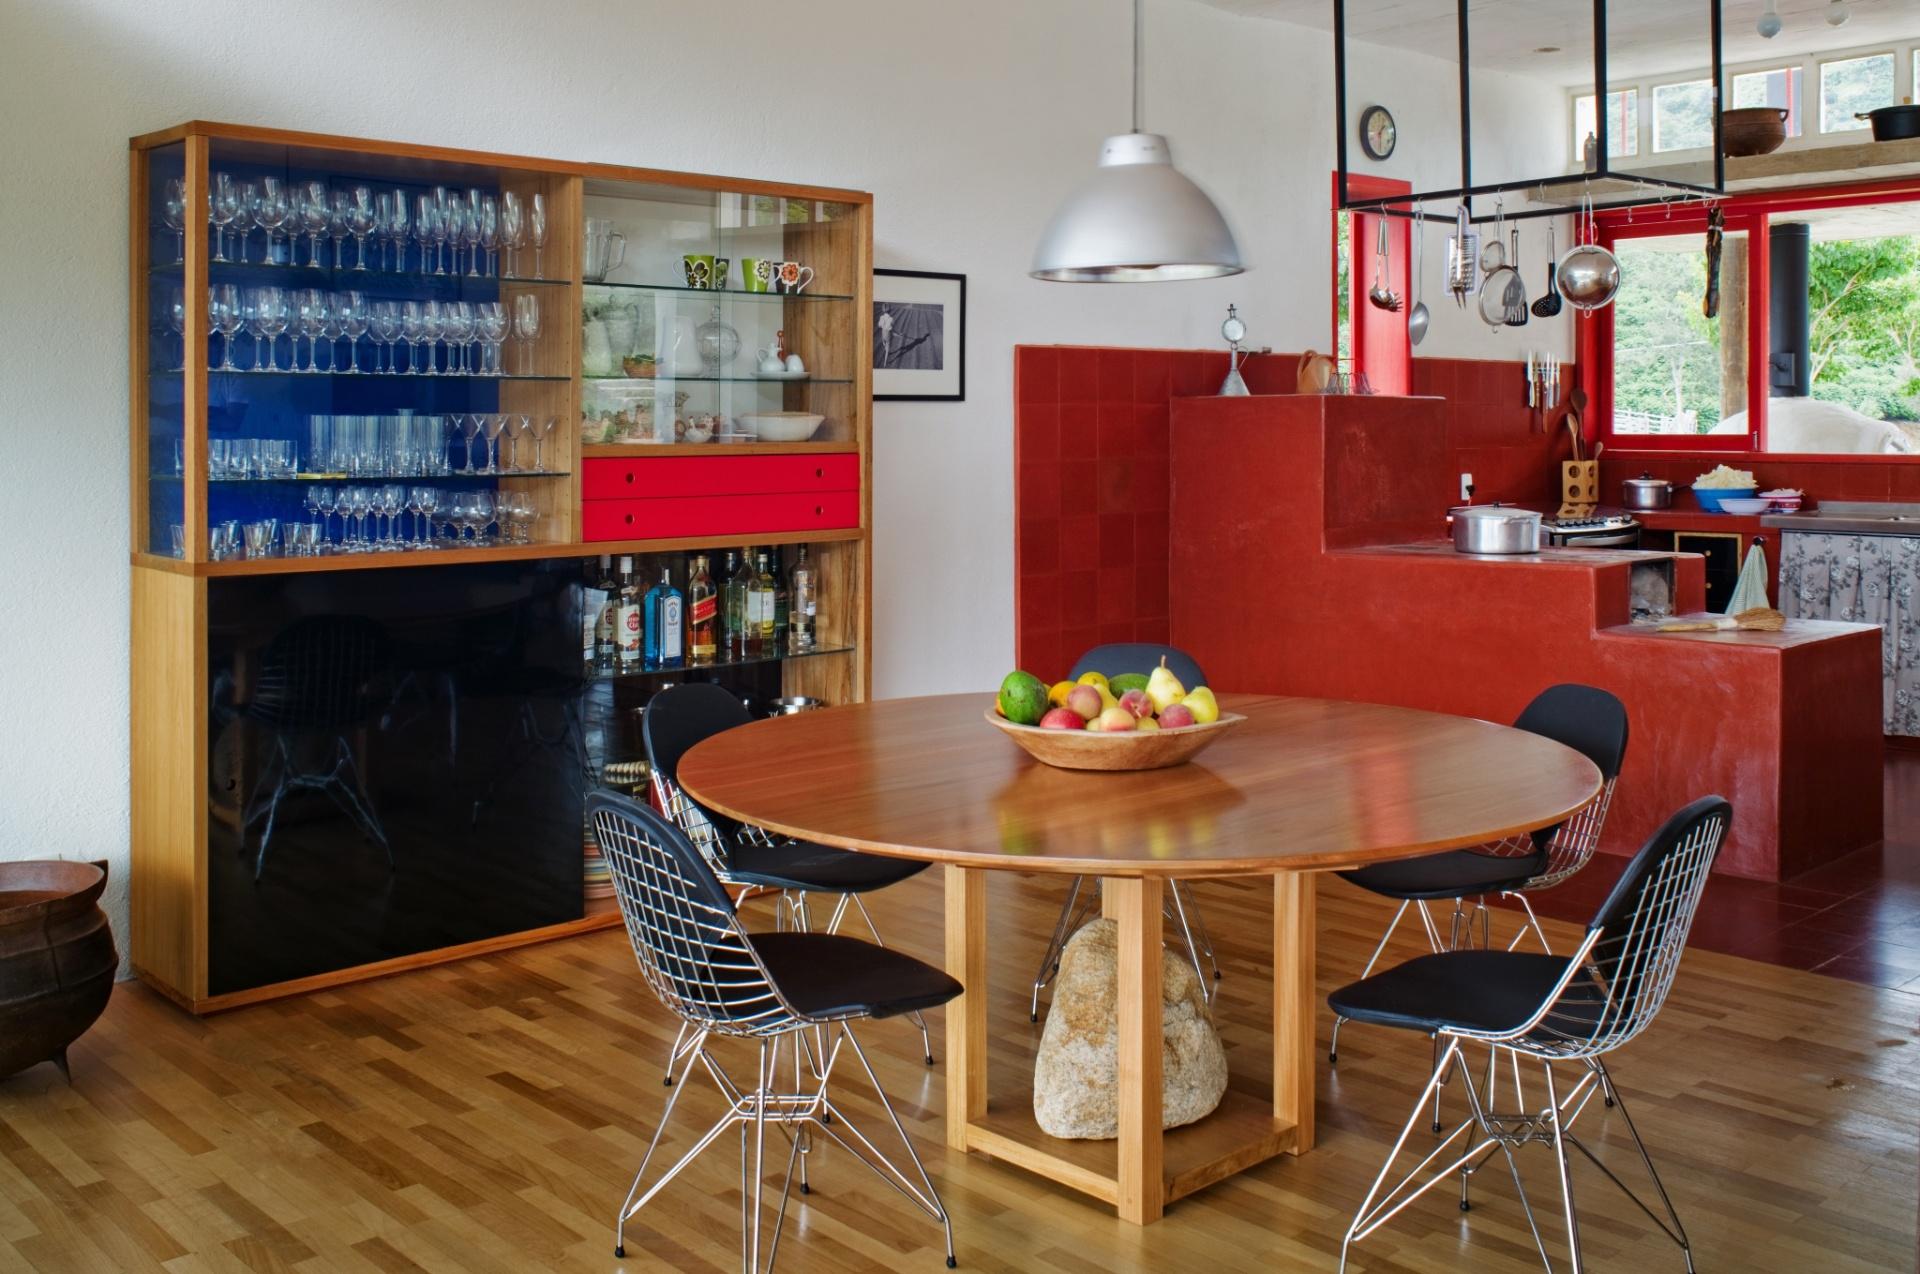 Salas de jantar: ideias para decorar o ambiente #B71426 1920 1274